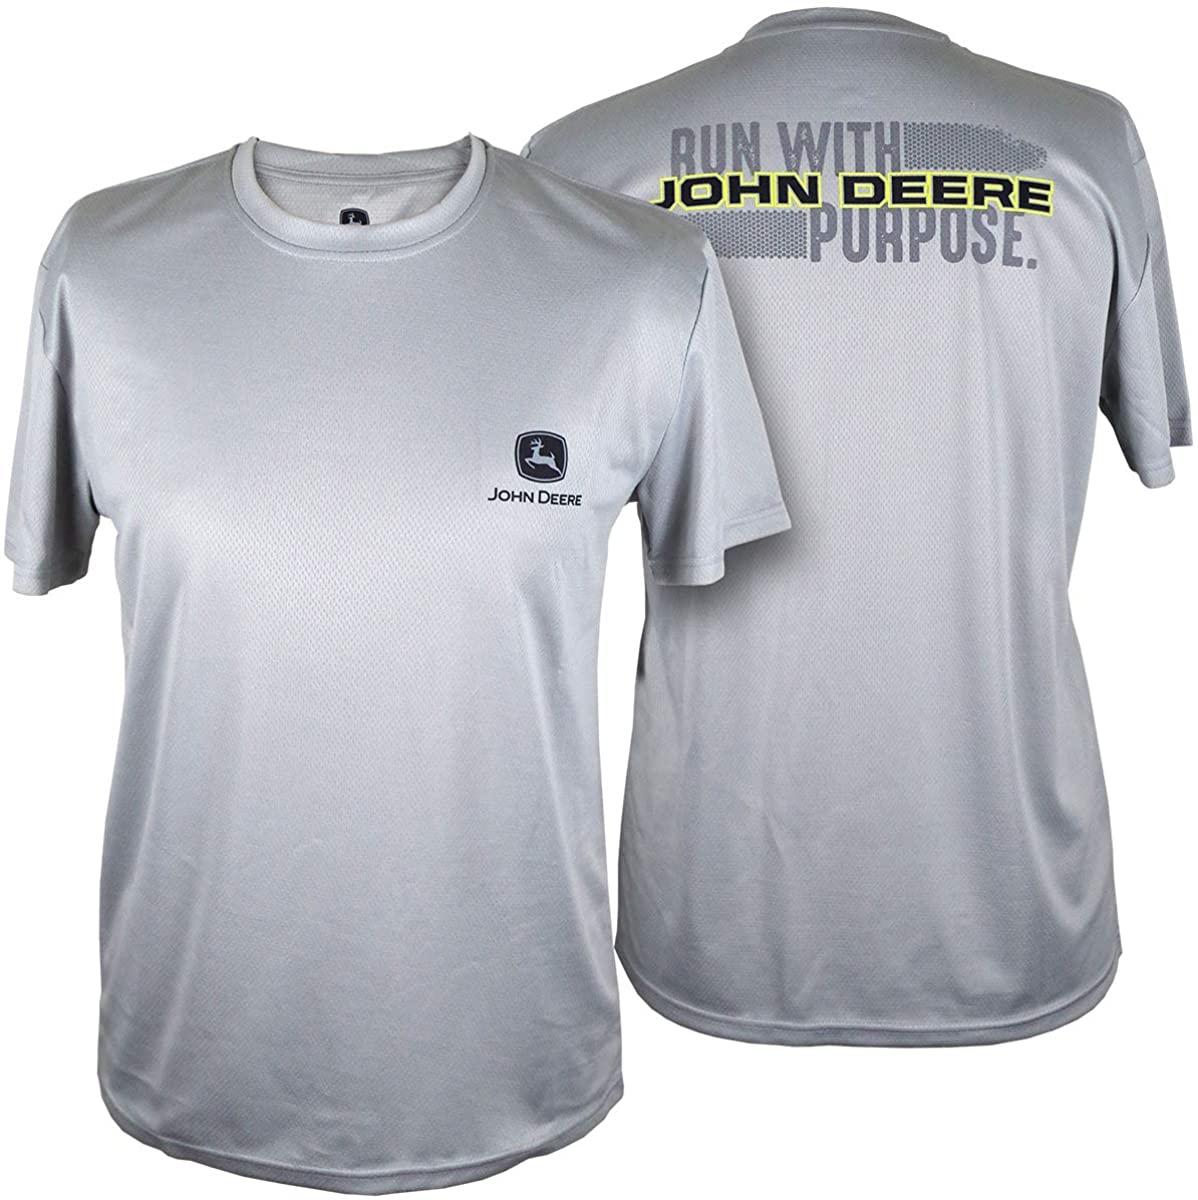 John Deere Nrlad- 2 Hit Ss Tee-Oxford-XL